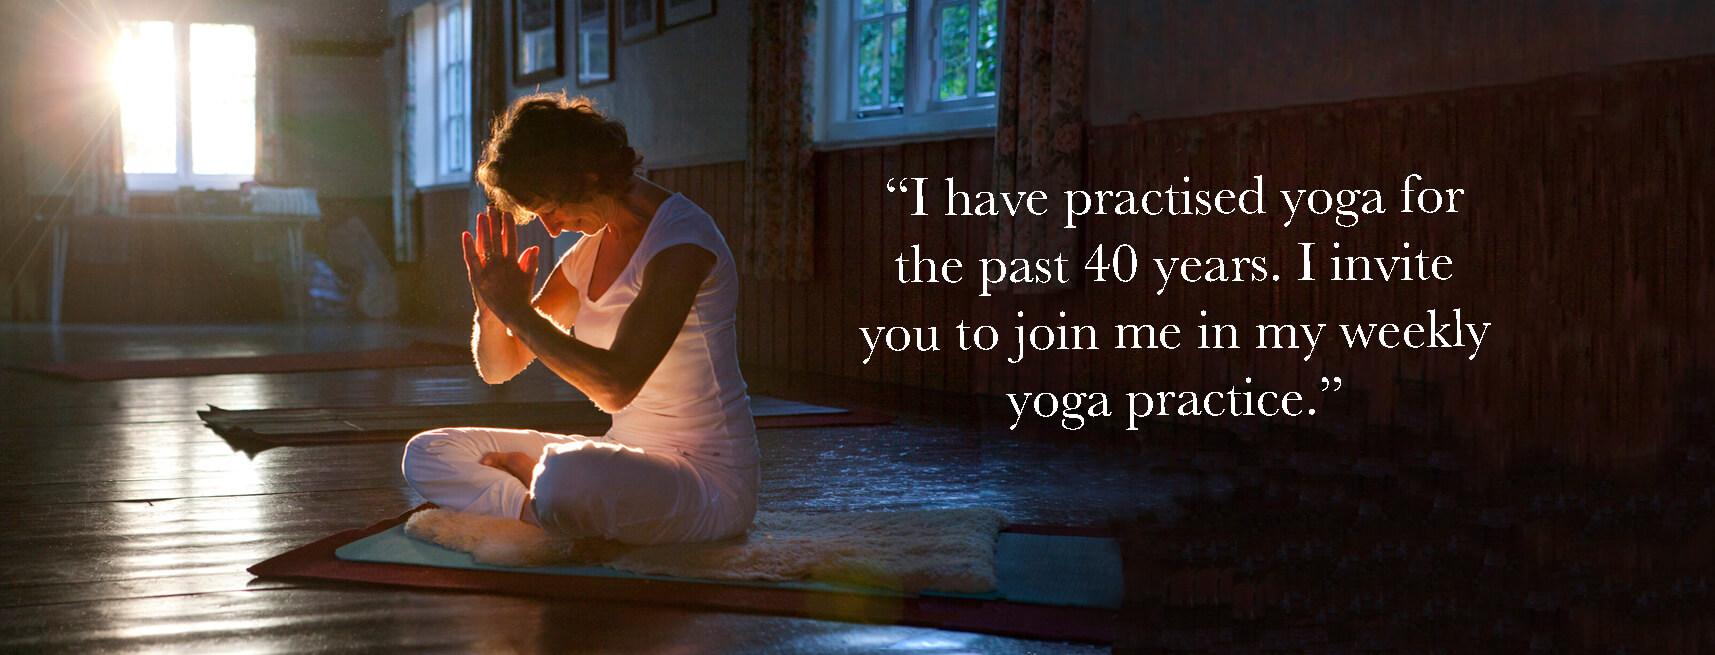 http://www.altaihealing.com/wp-content/uploads/2016/06/Yoga-Opener.jpg